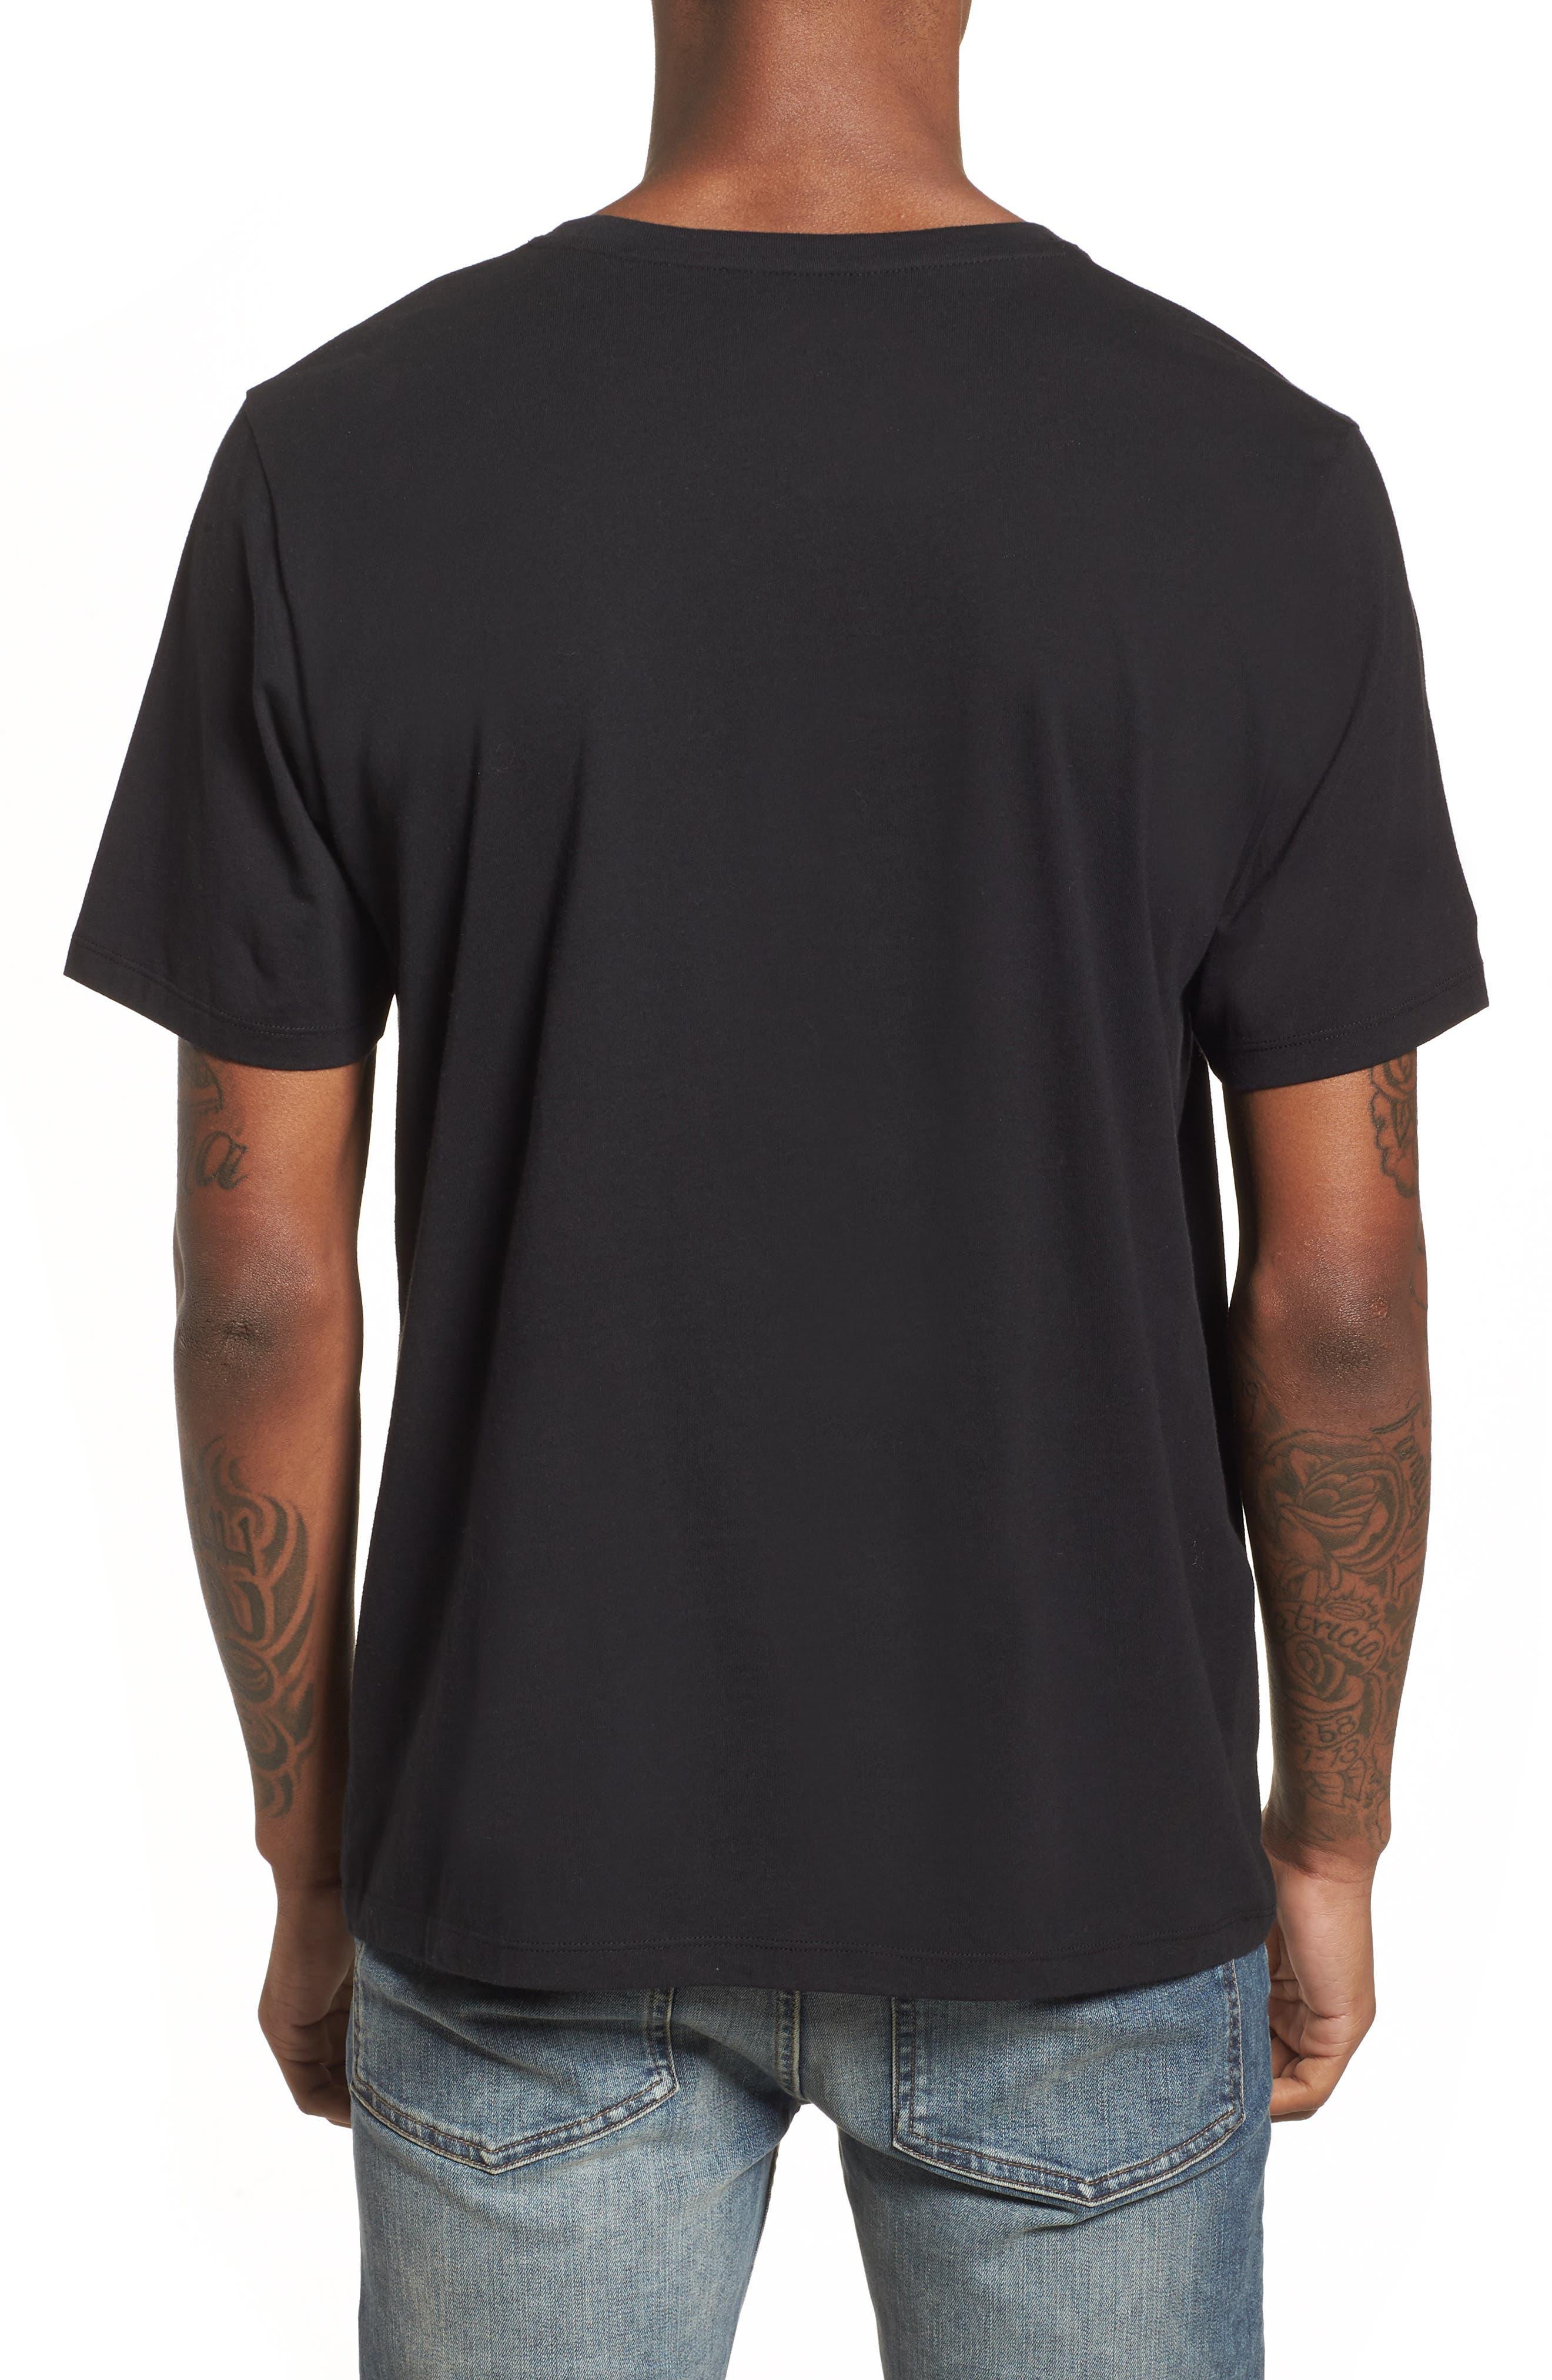 Cherub Graphic T-Shirt,                             Alternate thumbnail 2, color,                             Black